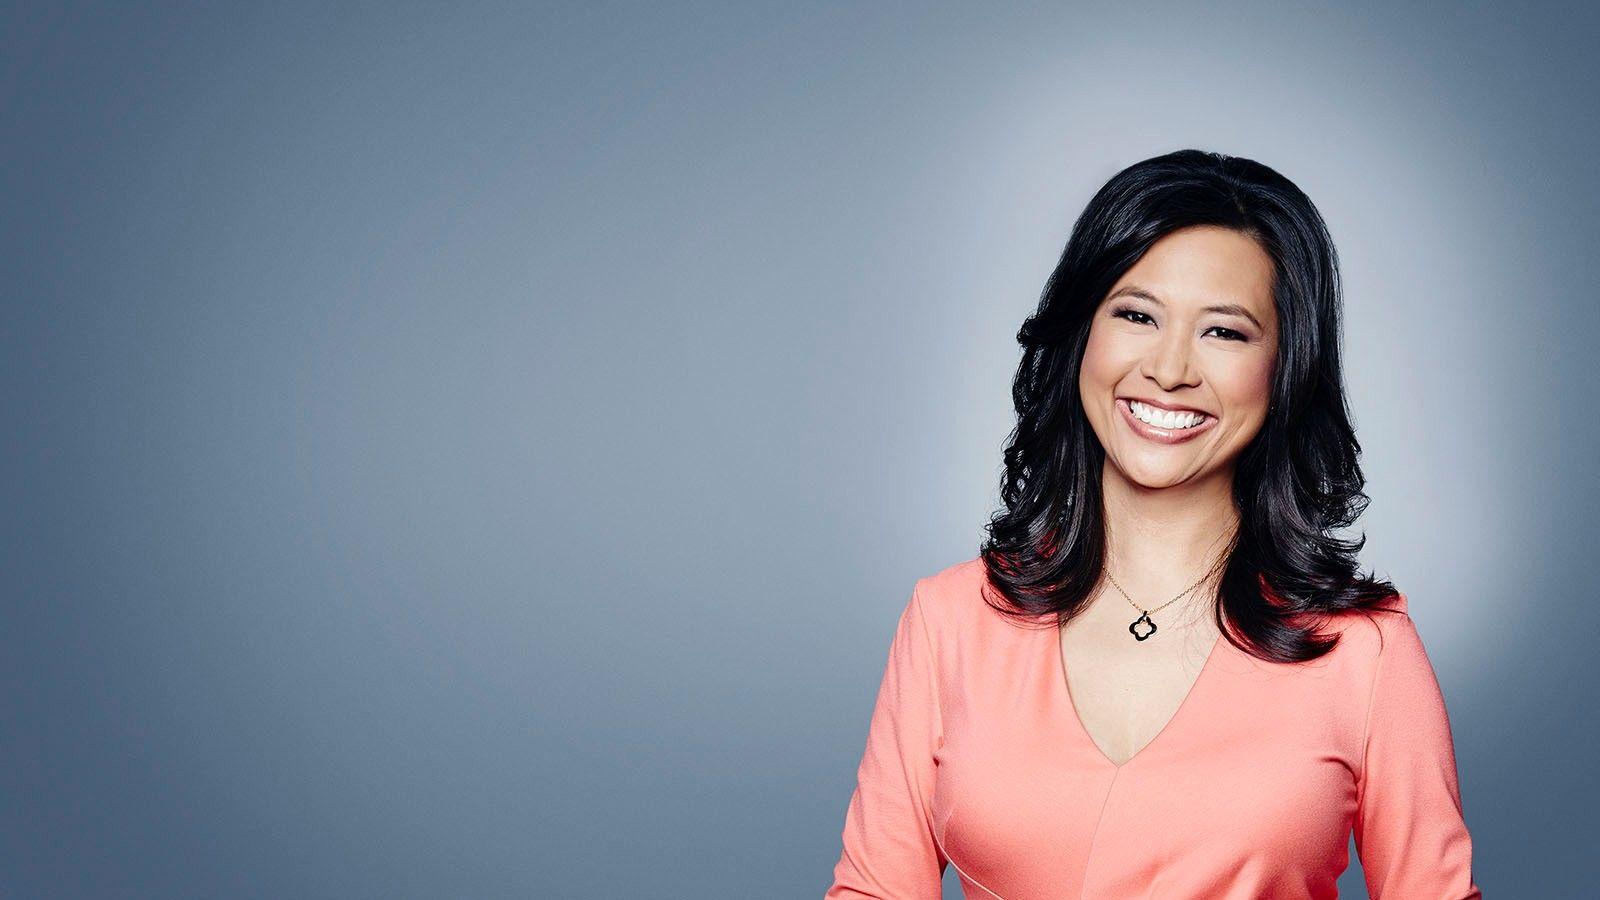 Rae Dawn Chong Lesbian Minimalist maribel aber ♥ | cloning candidates | pinterest